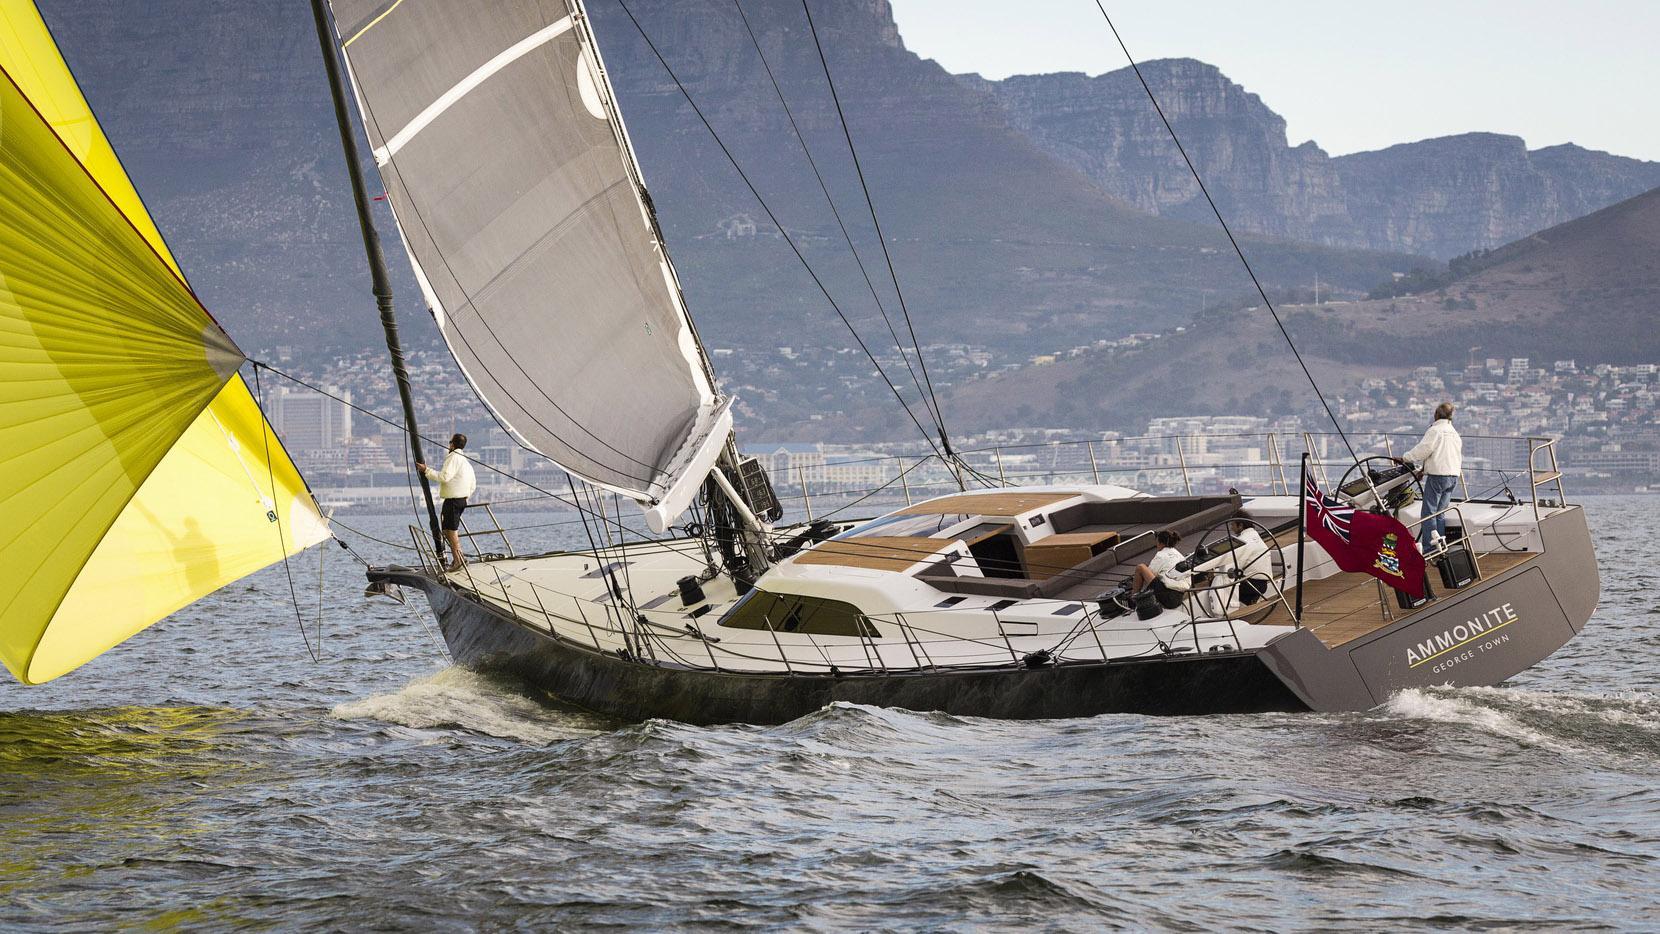 ammonite sailing yacht sws 2016 25m running half stern